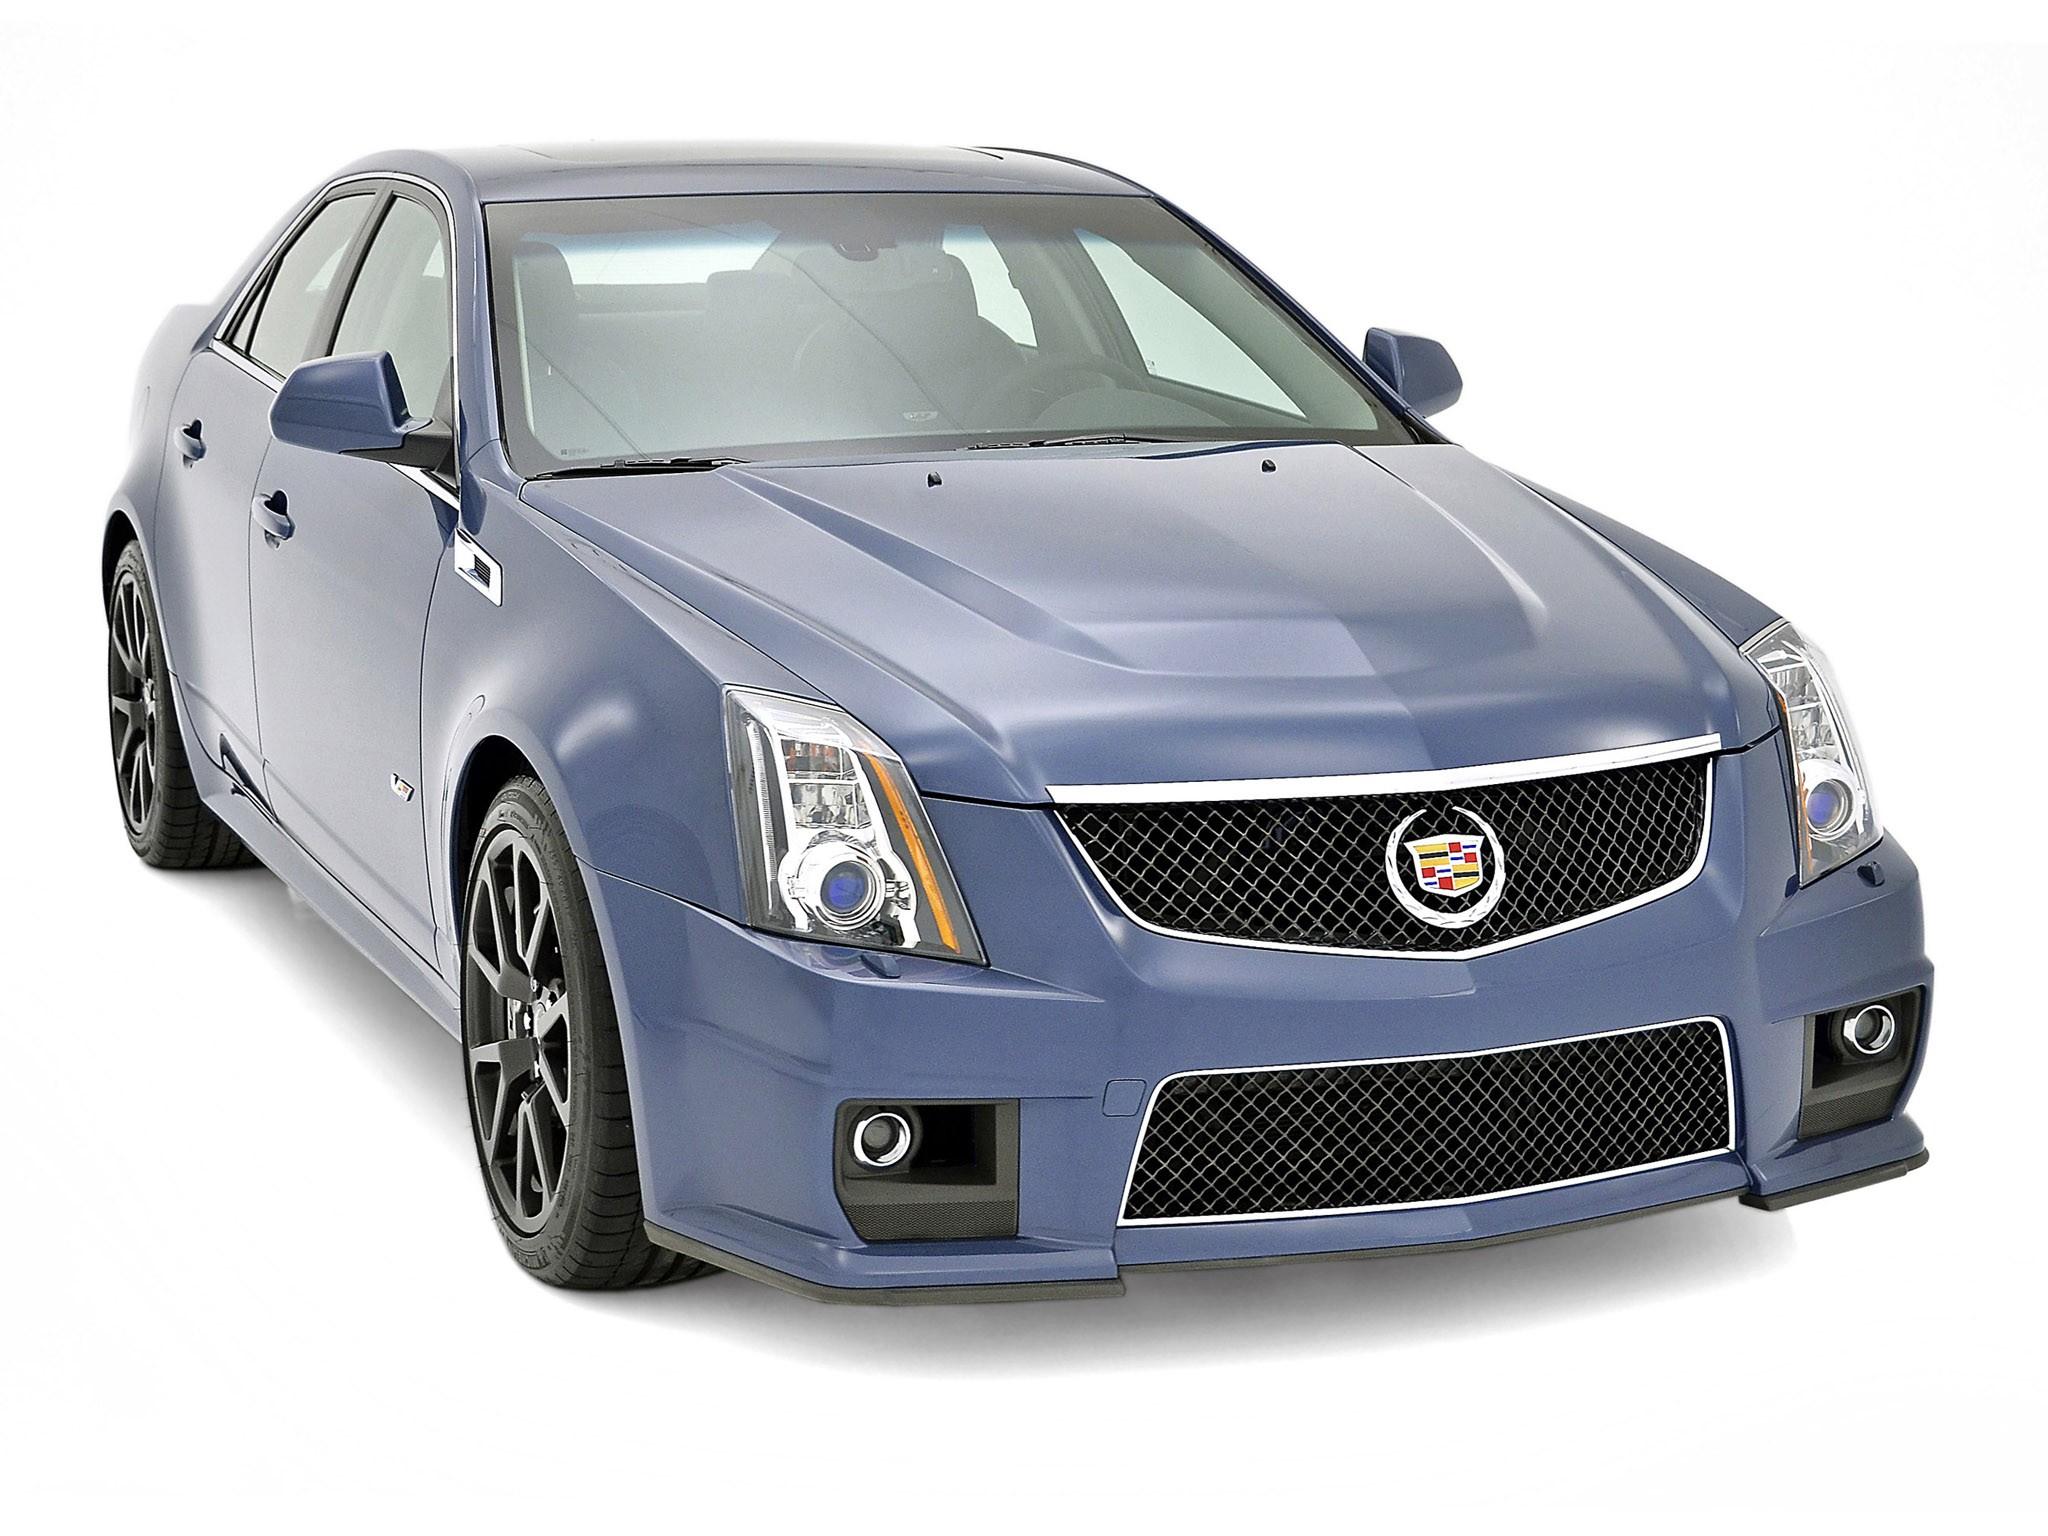 2013 Cadillac TS-V Stealth Blue Edition